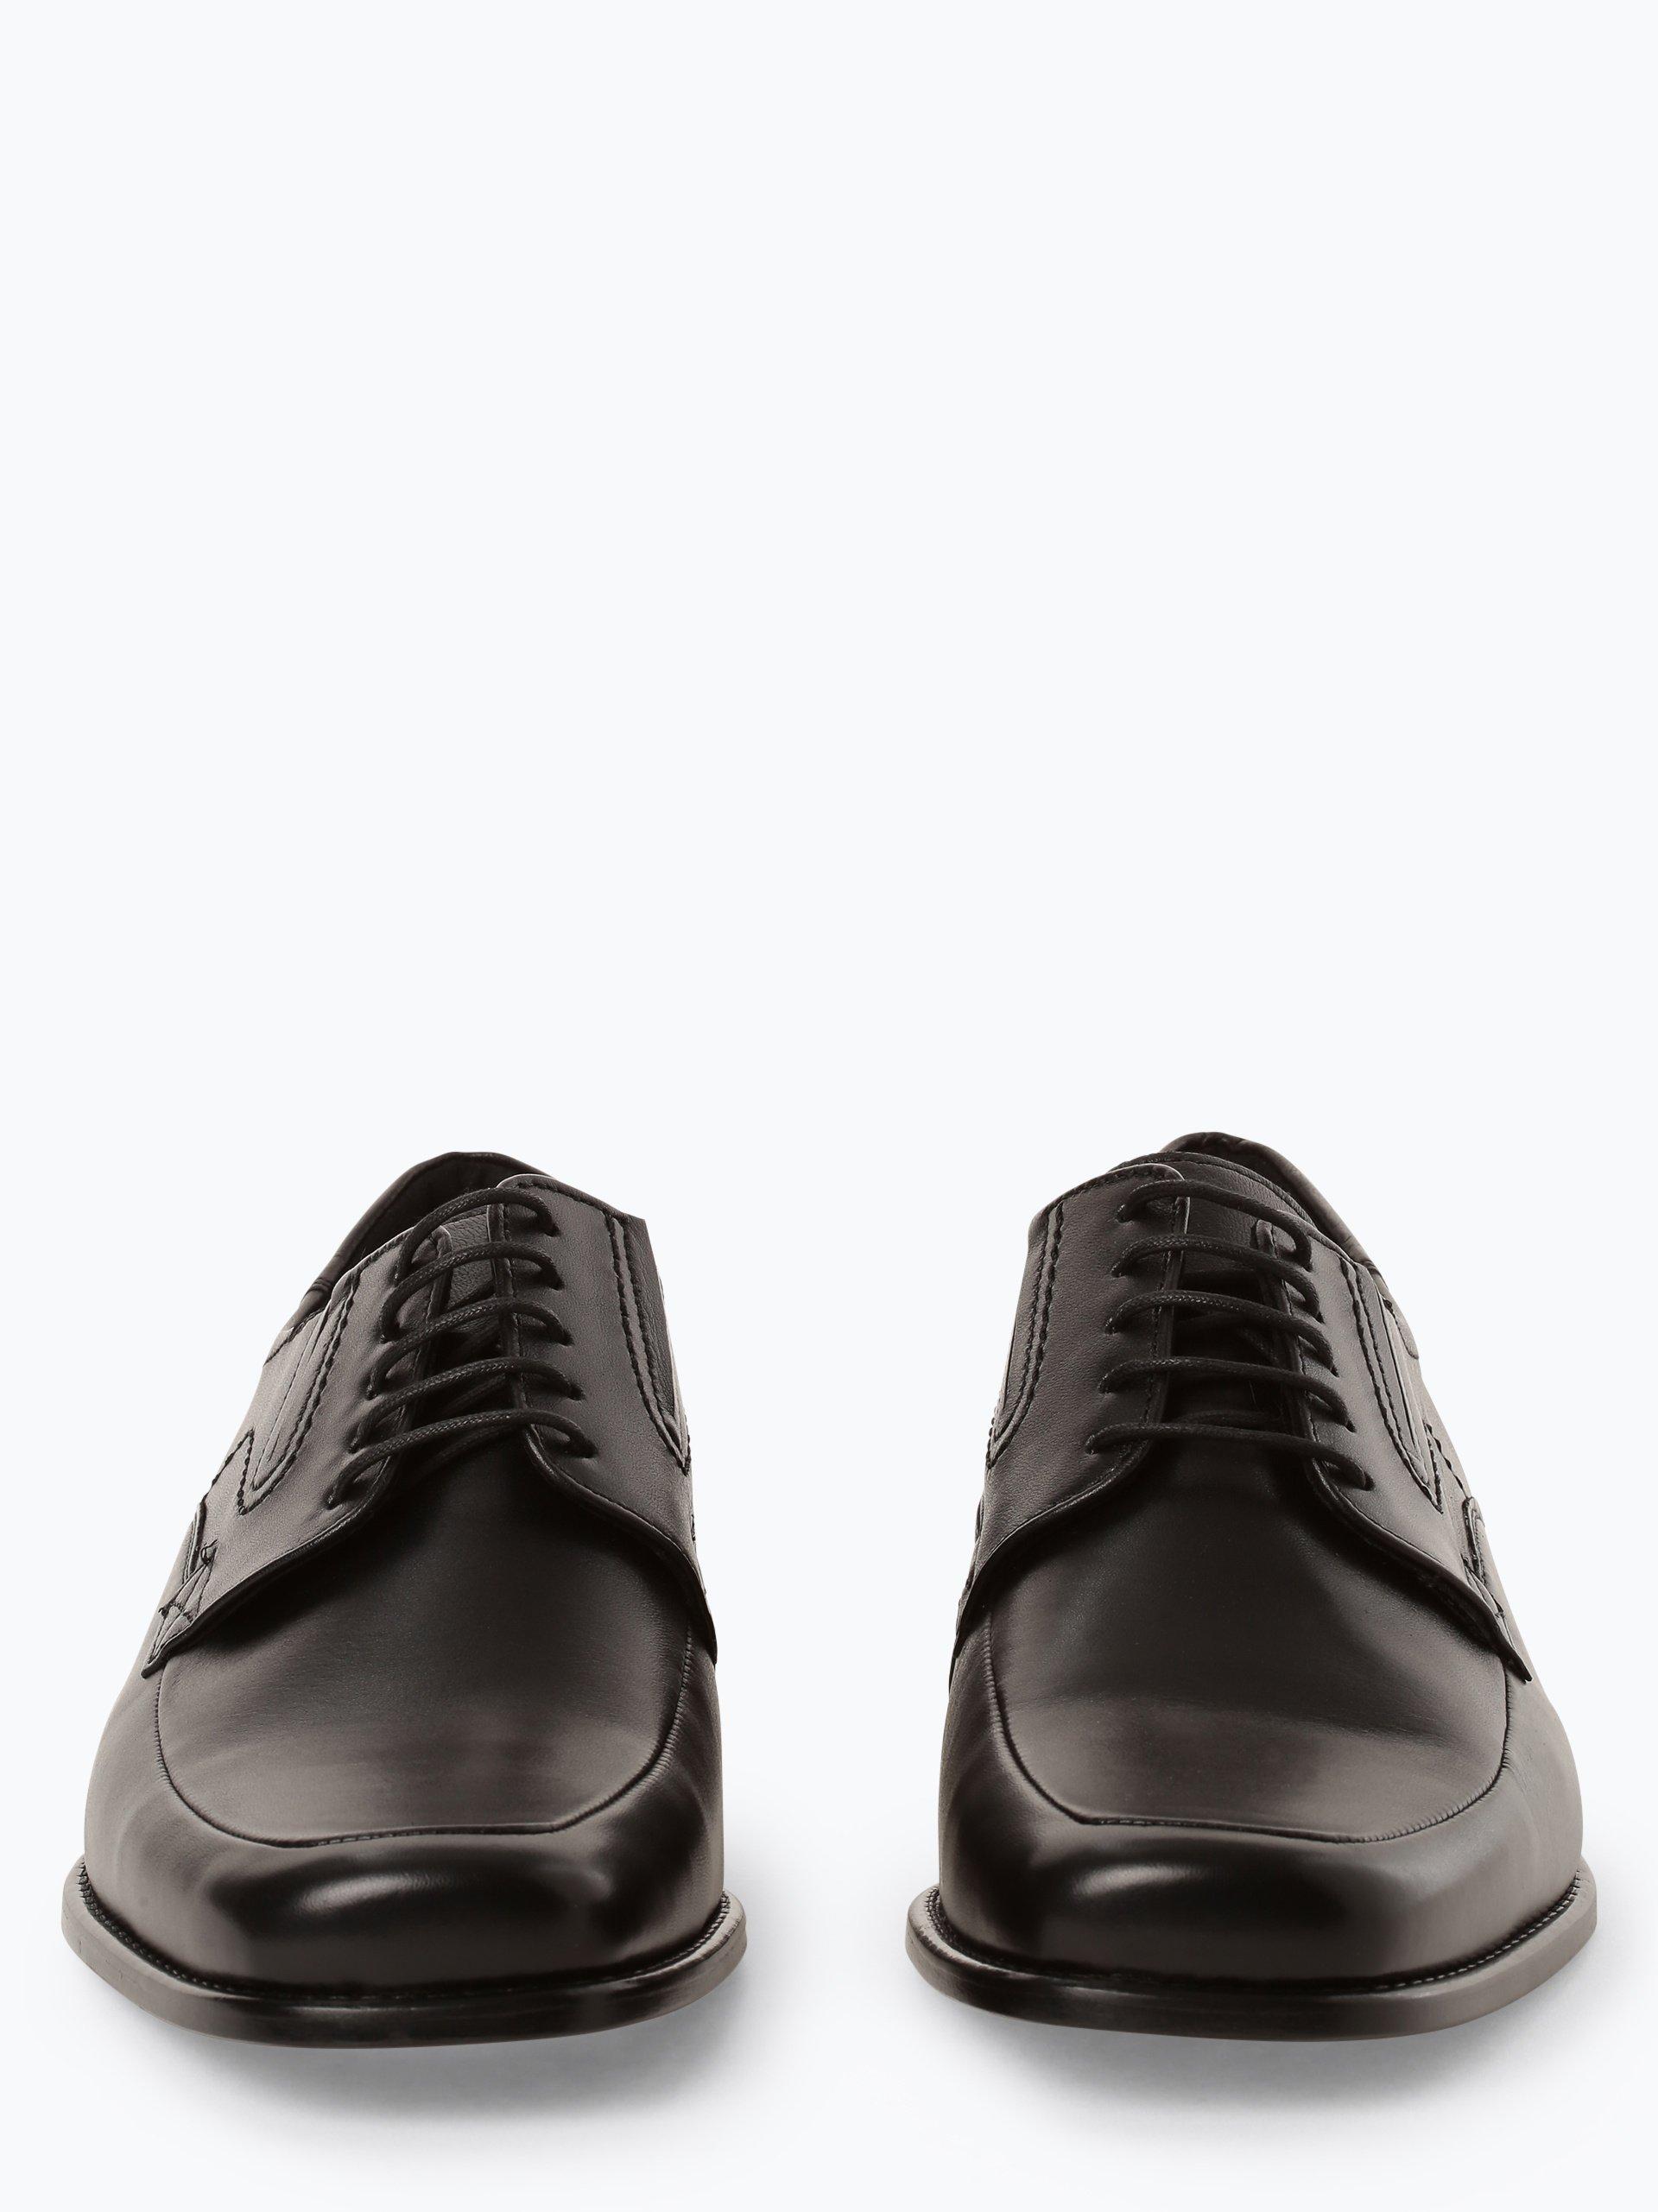 Lloyd Męskie buty sznurowane ze skóry – Kelton